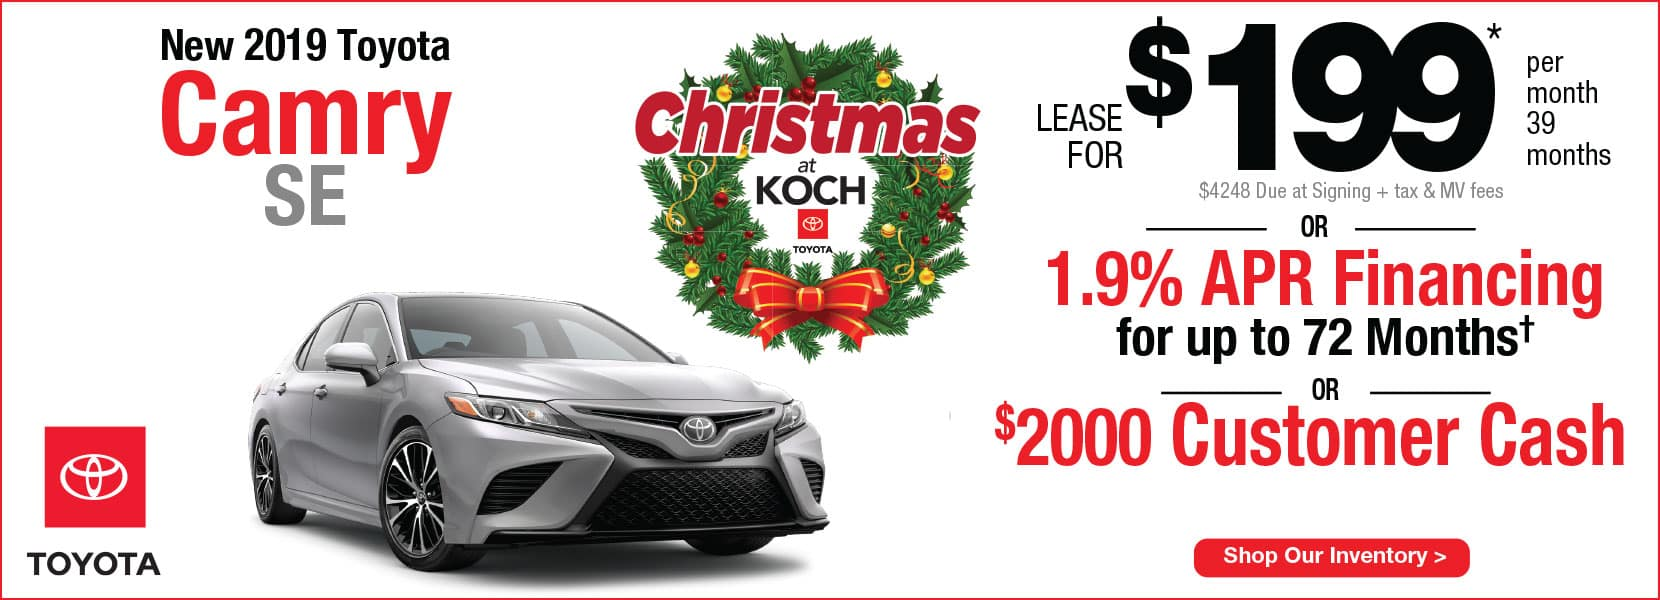 New 2019 Toyota Camry SE Lease Koch 33 Toyota Easton PA